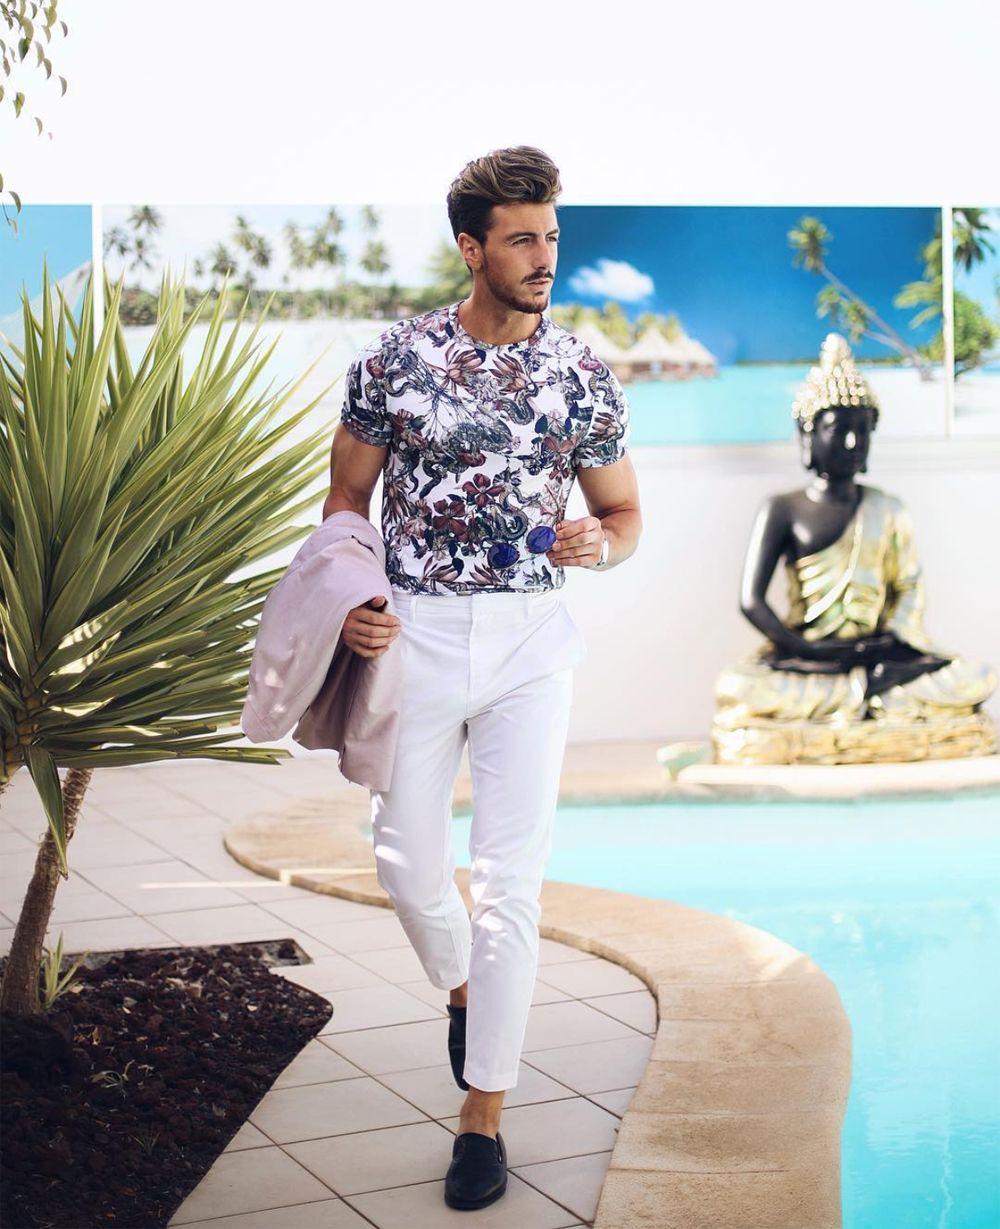 tendencia-de-moda-big-estampas-masculinas